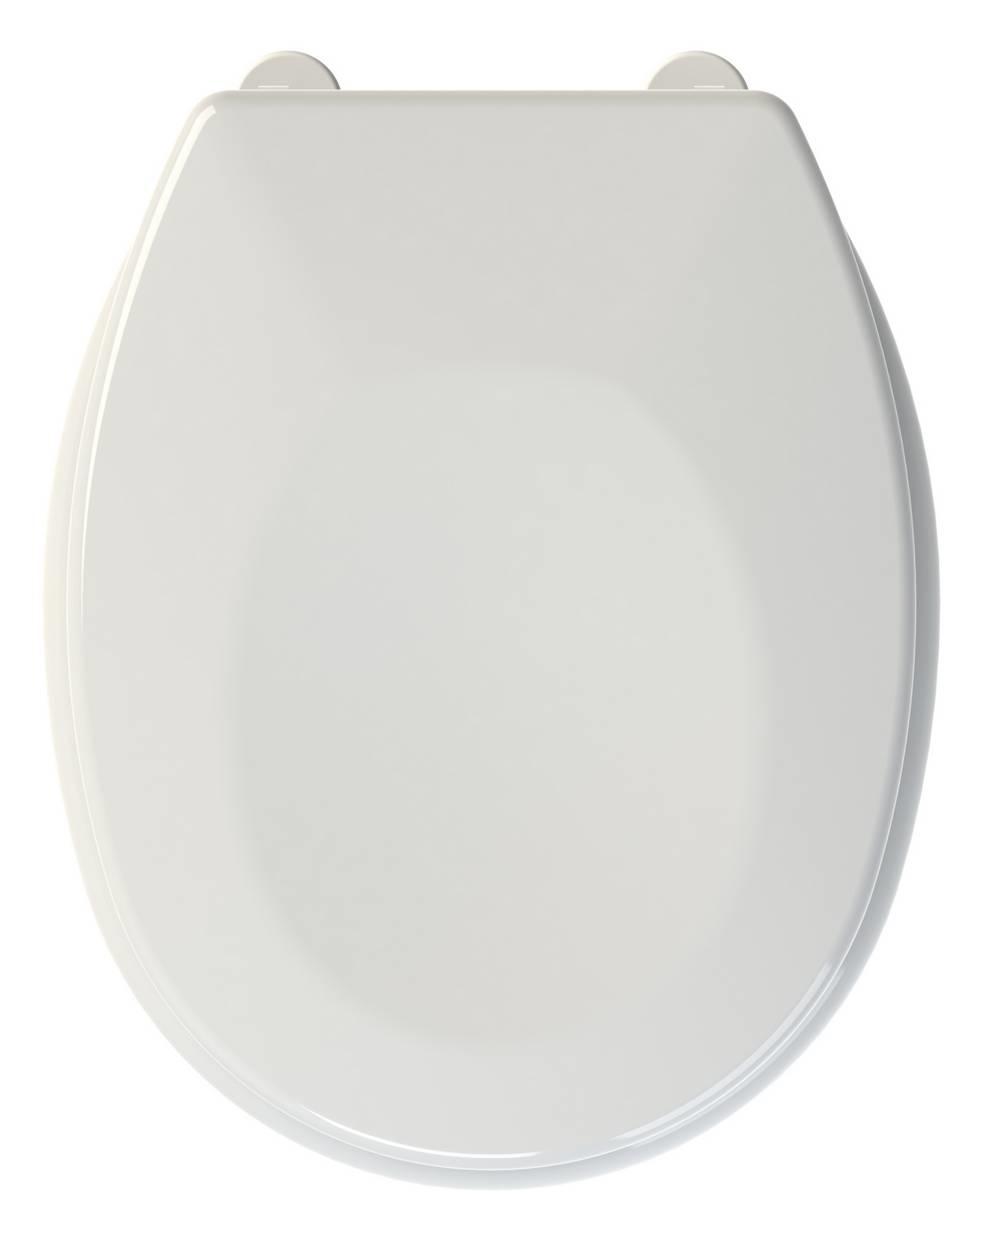 BRISTOL - WC-zitting - Glanzend Wit